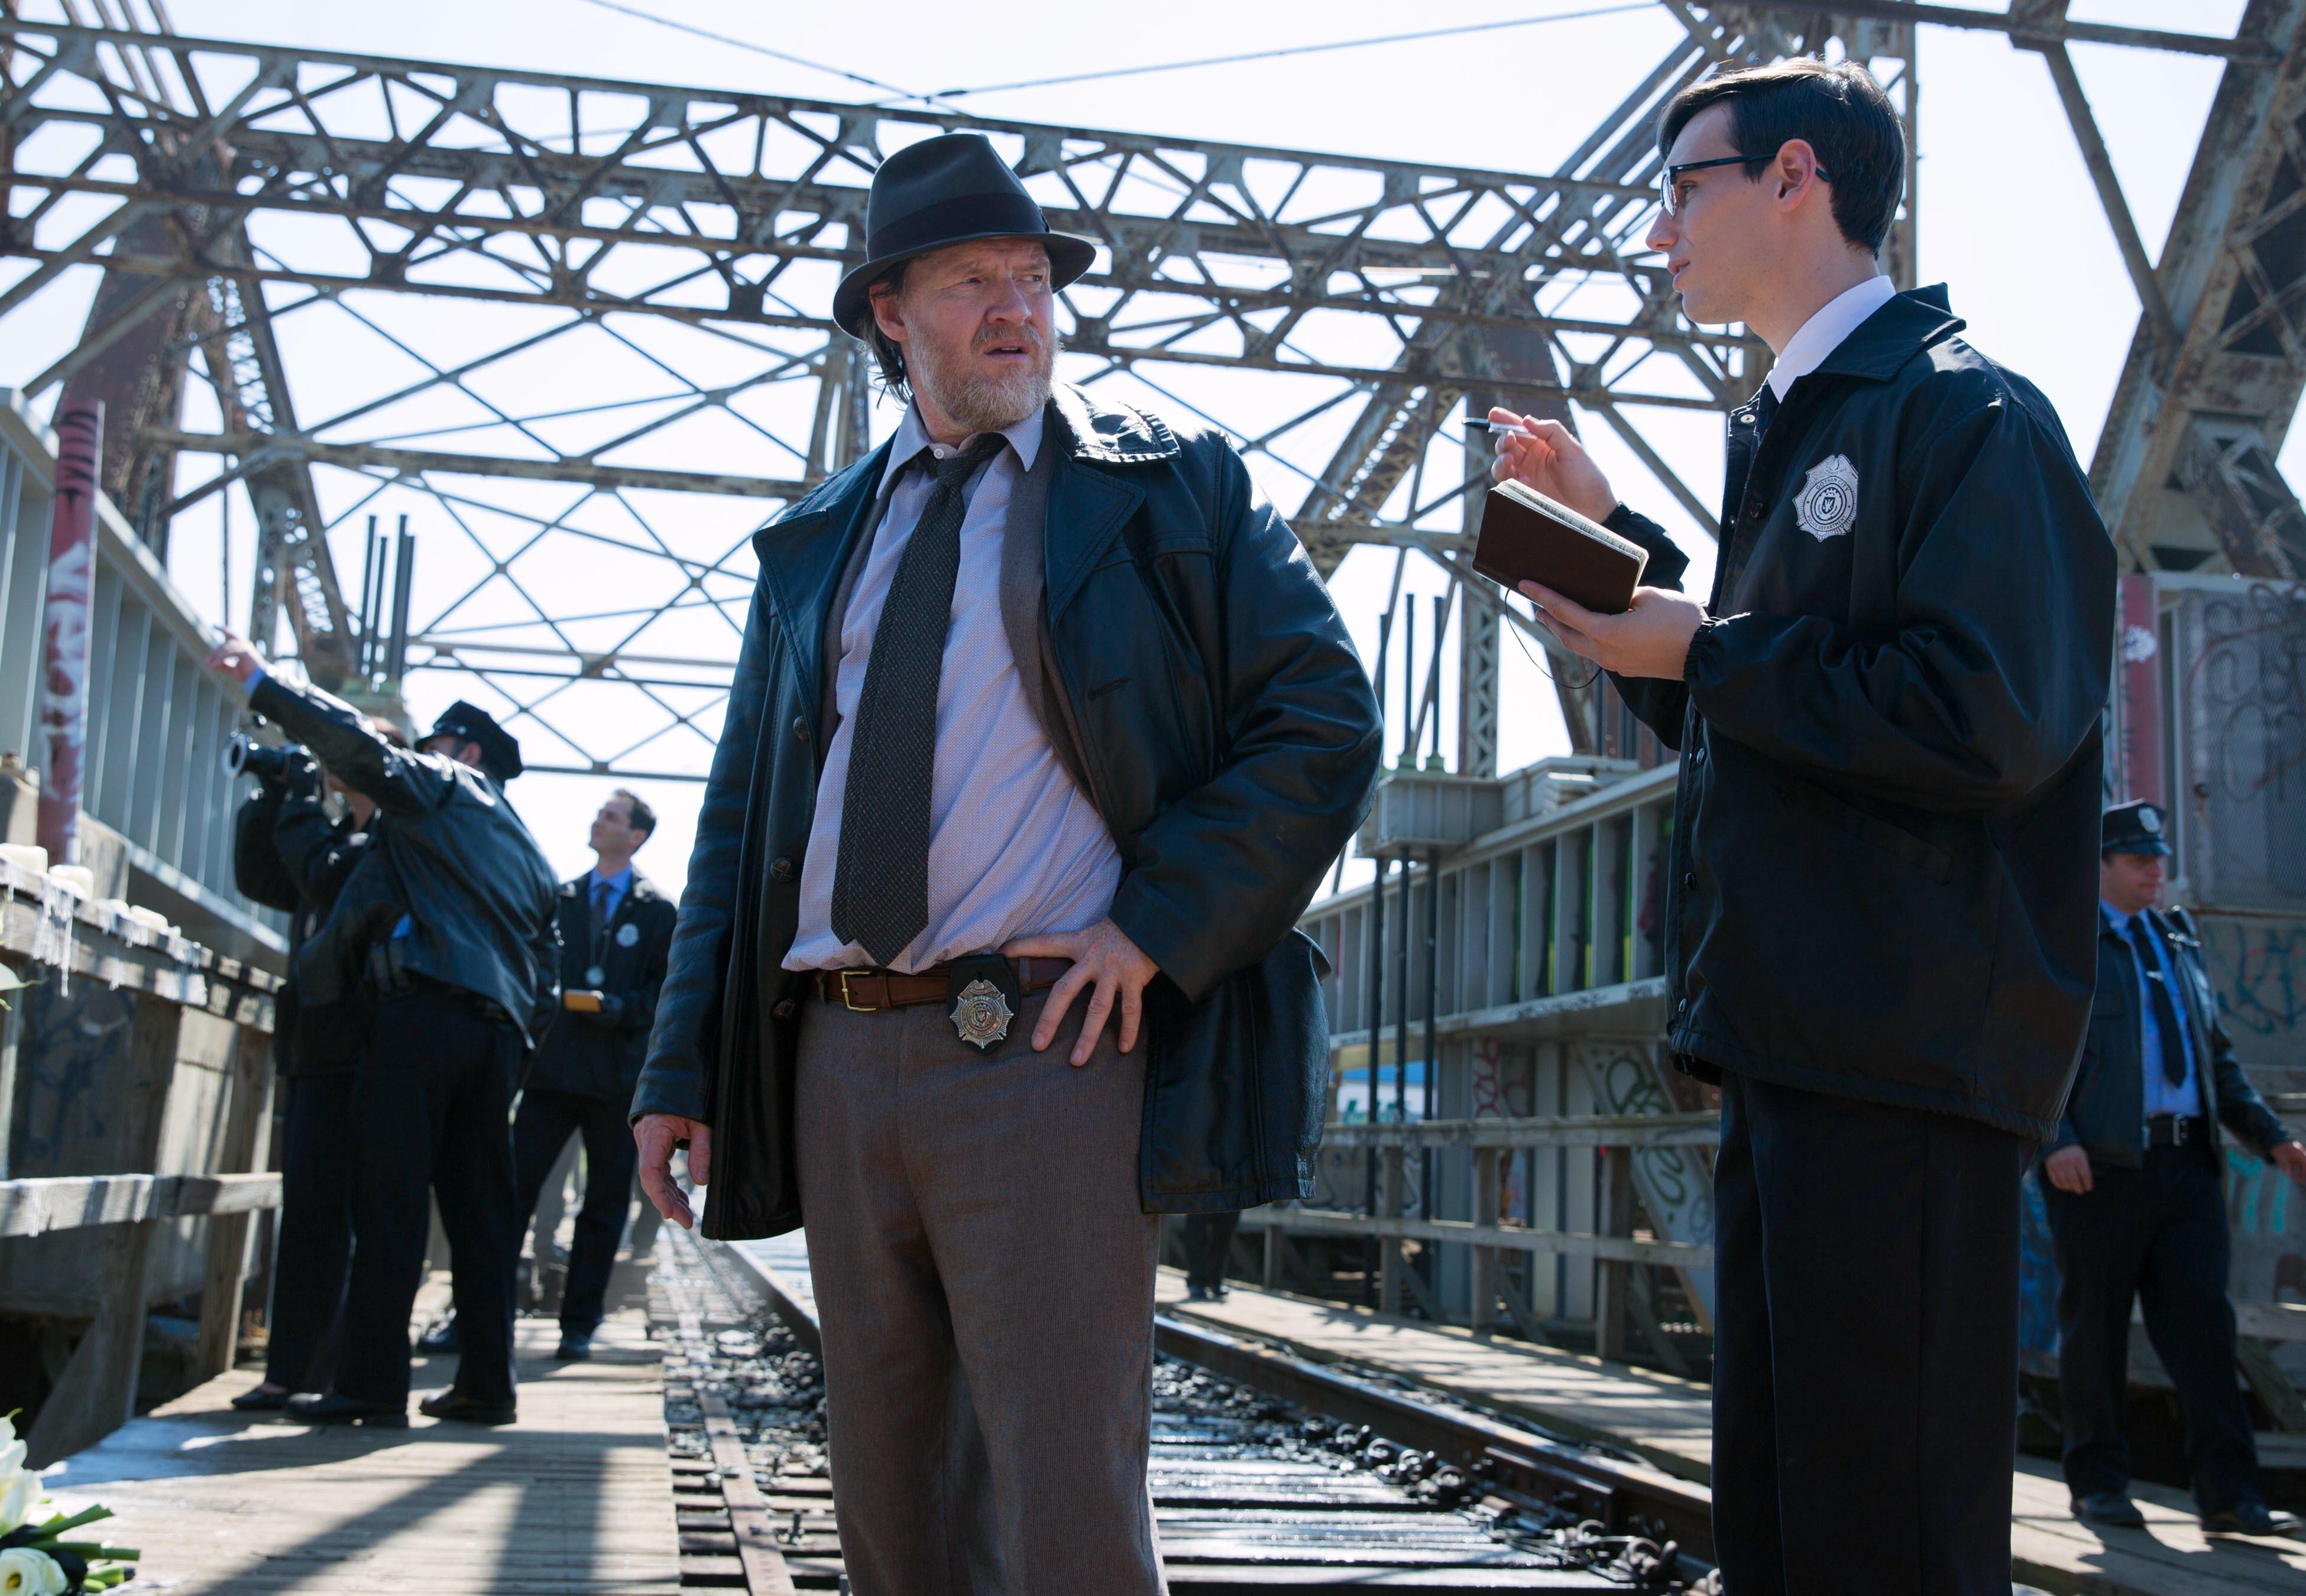 Gotham_106_RailRoadBridge_8355r_16570b76